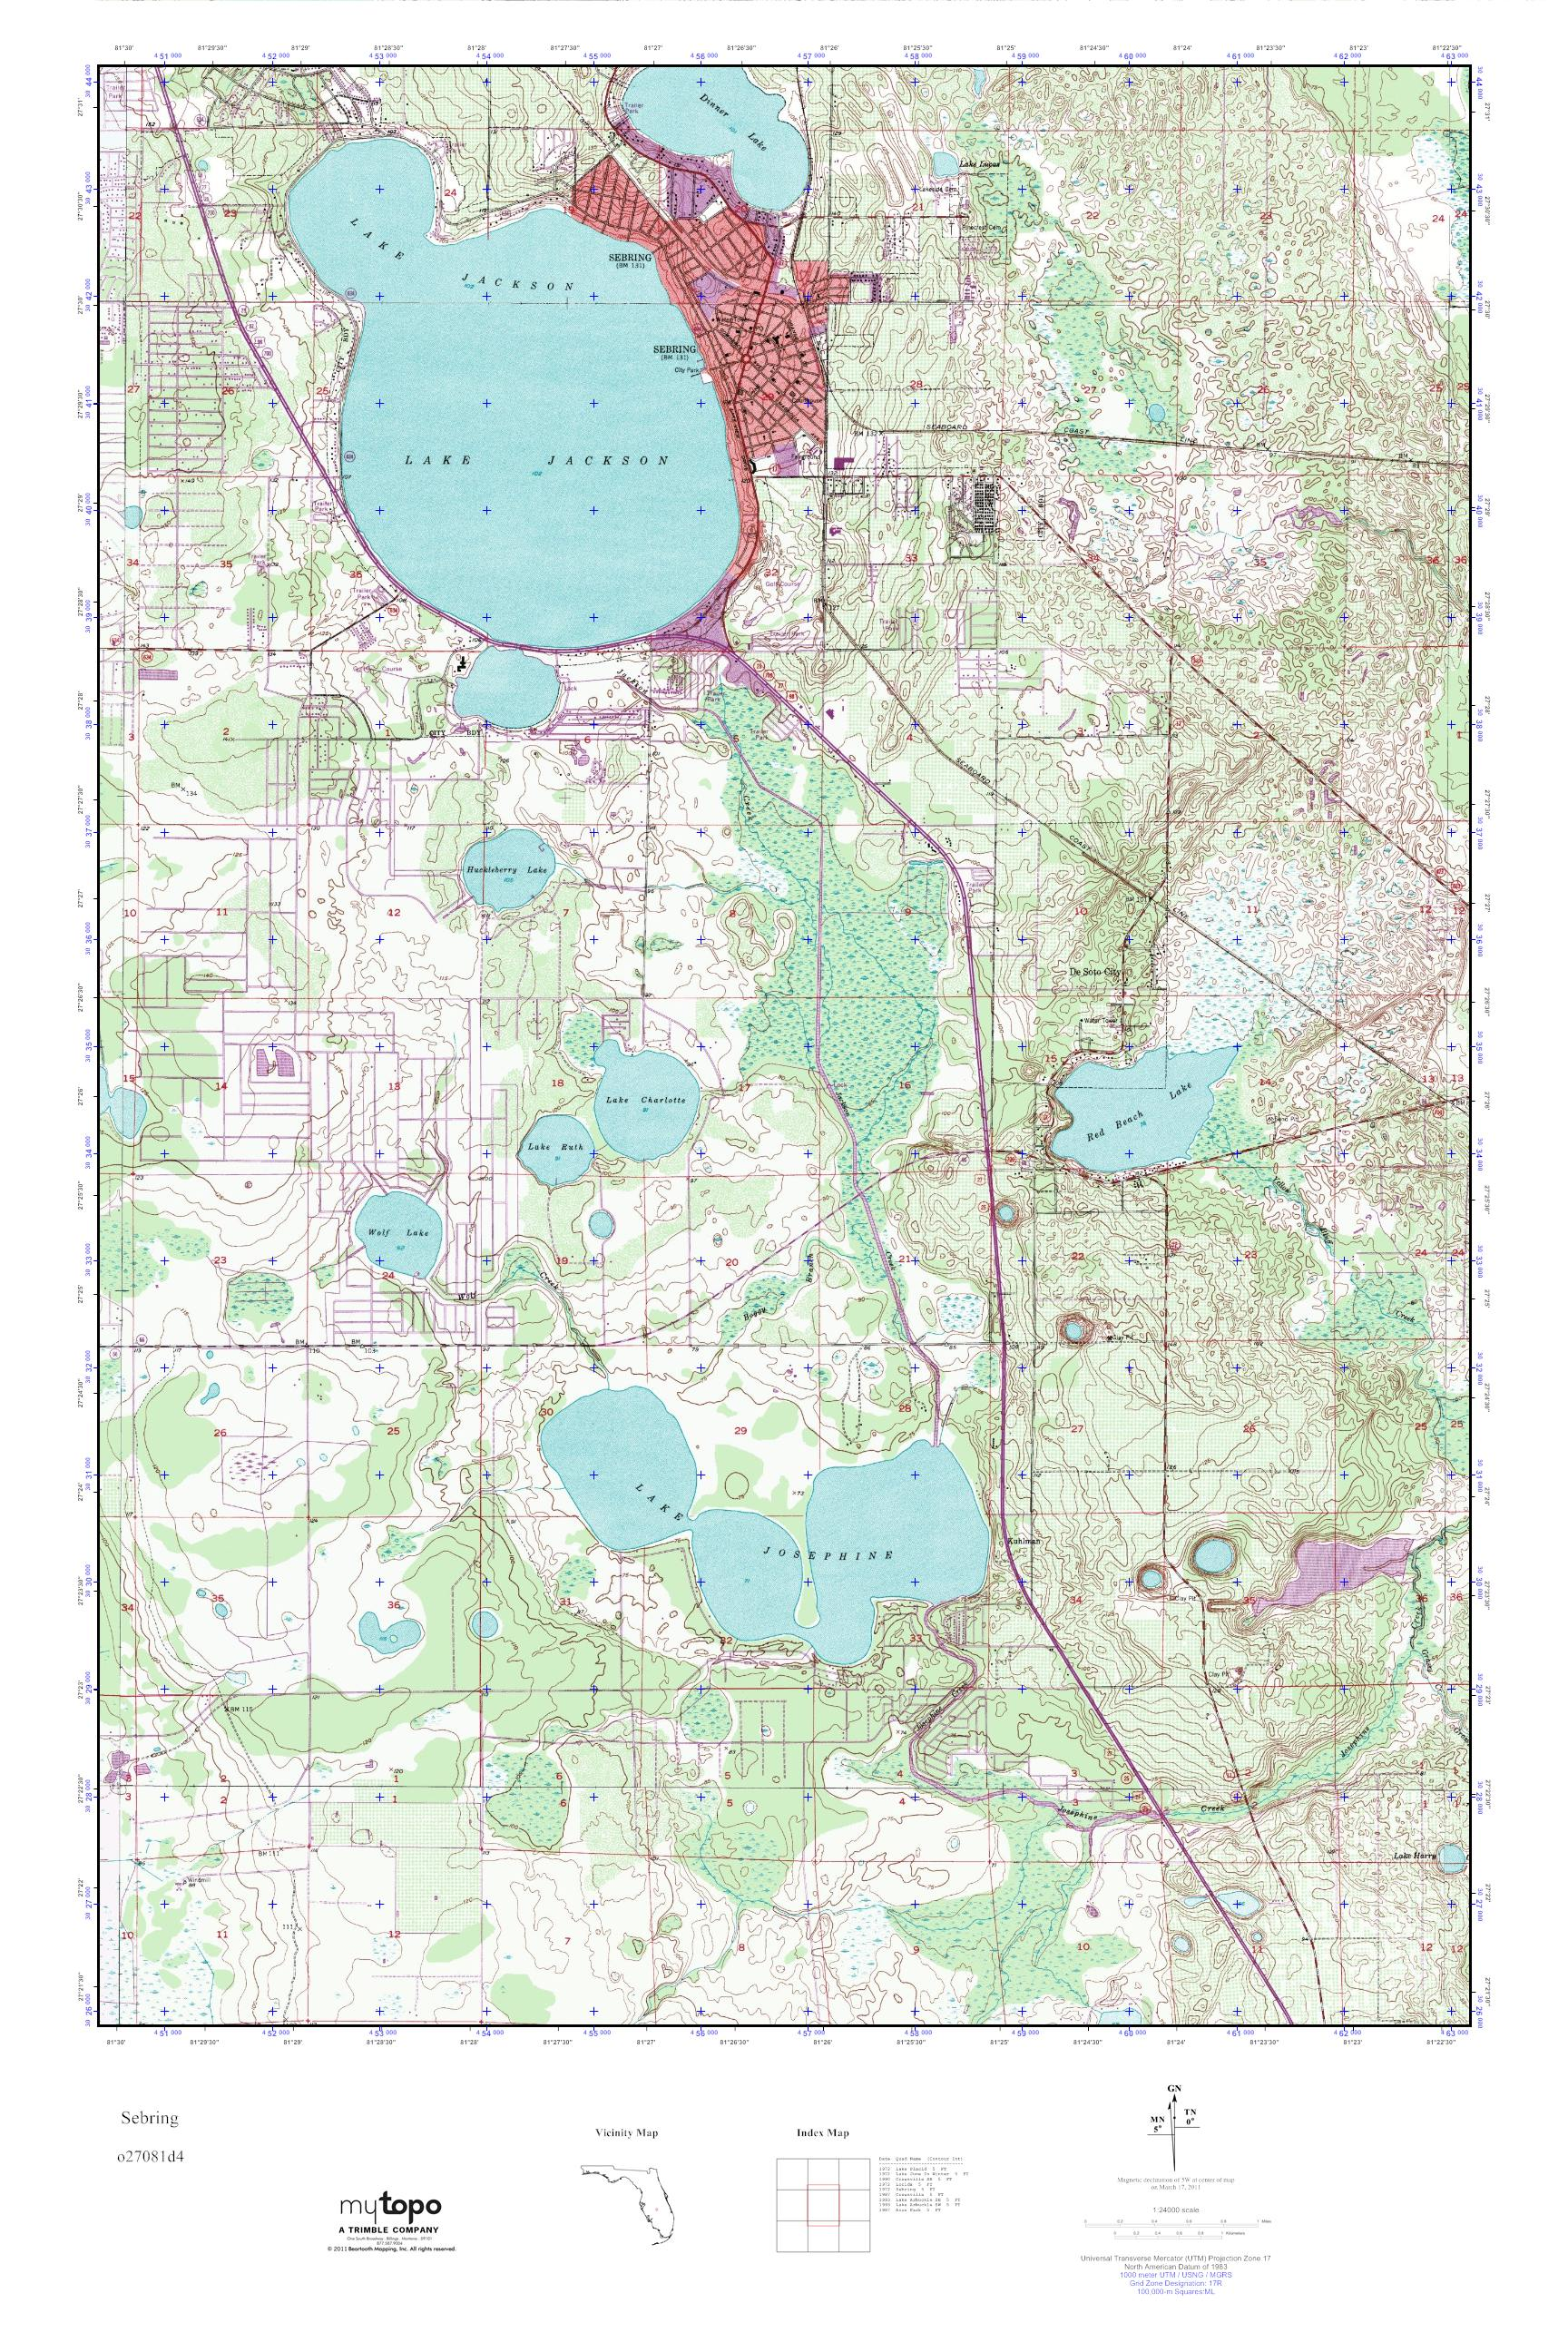 Sebring Florida Map.Mytopo Sebring Florida Usgs Quad Topo Map